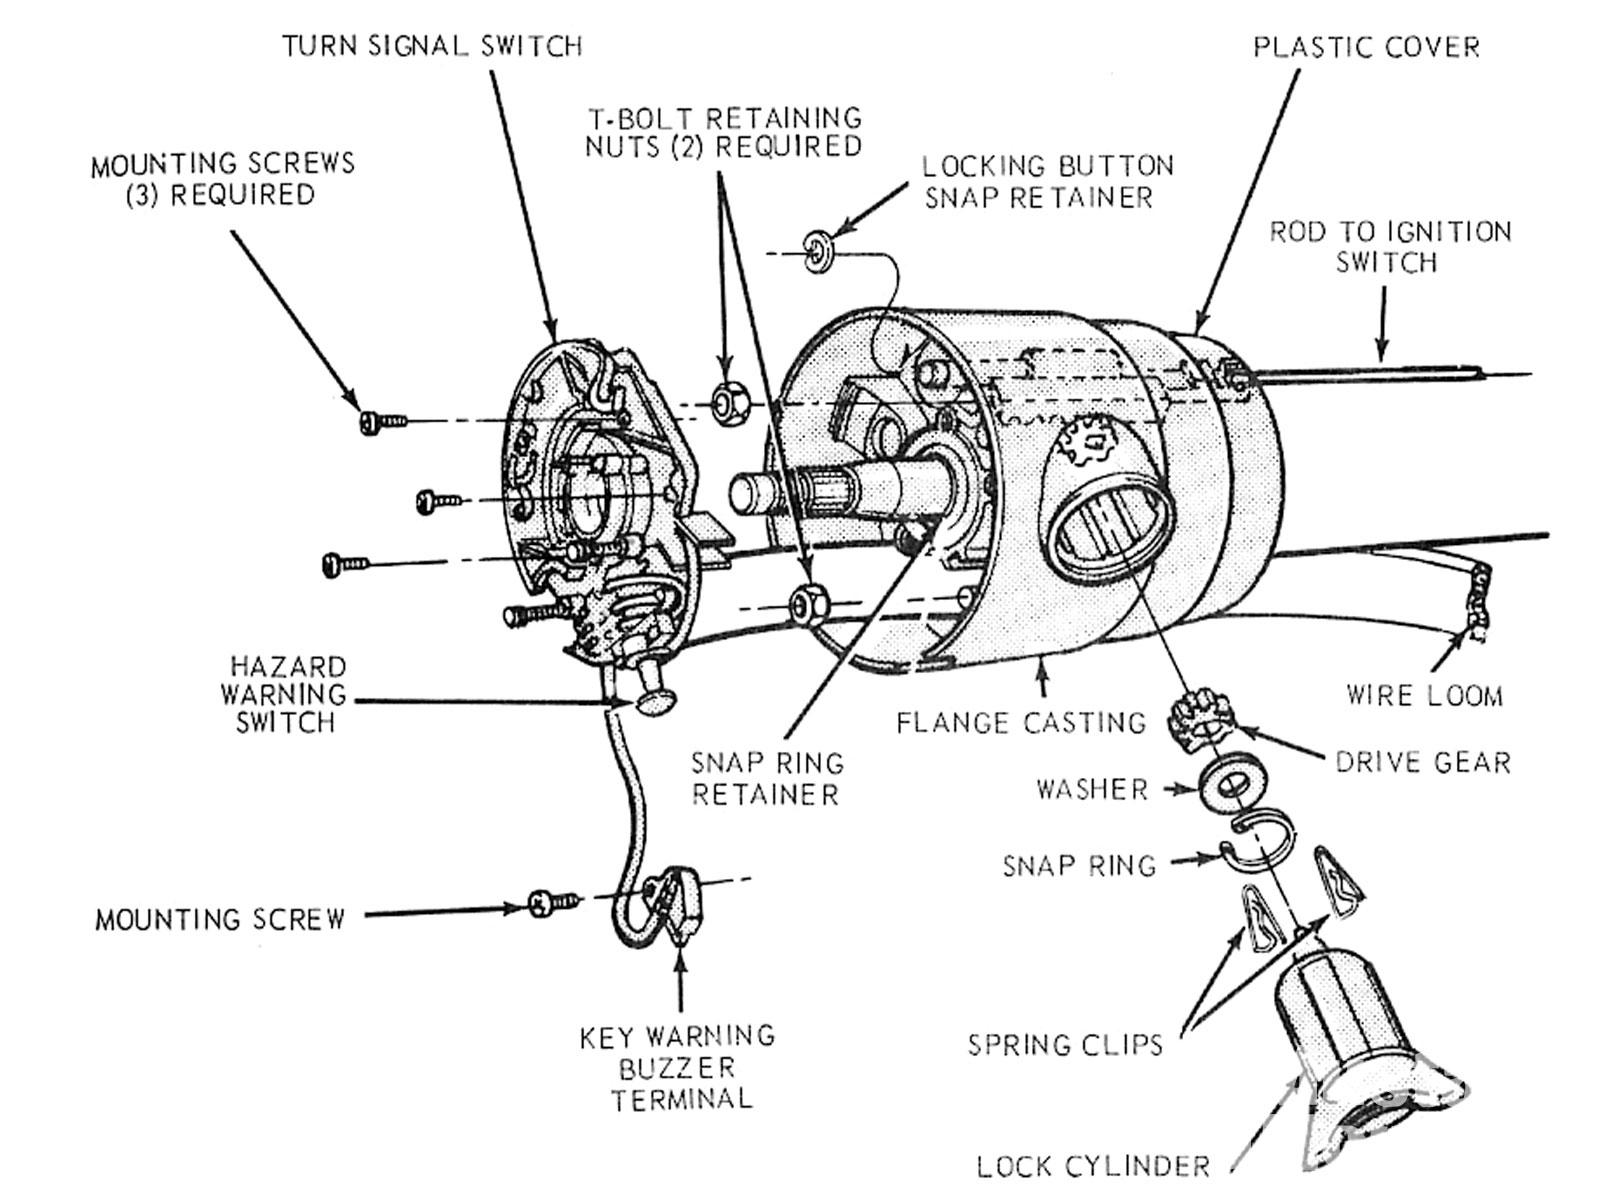 Wiring Adapter F100 To Gm Column   Wiring Diagram - Gm Steering Column Wiring Diagram